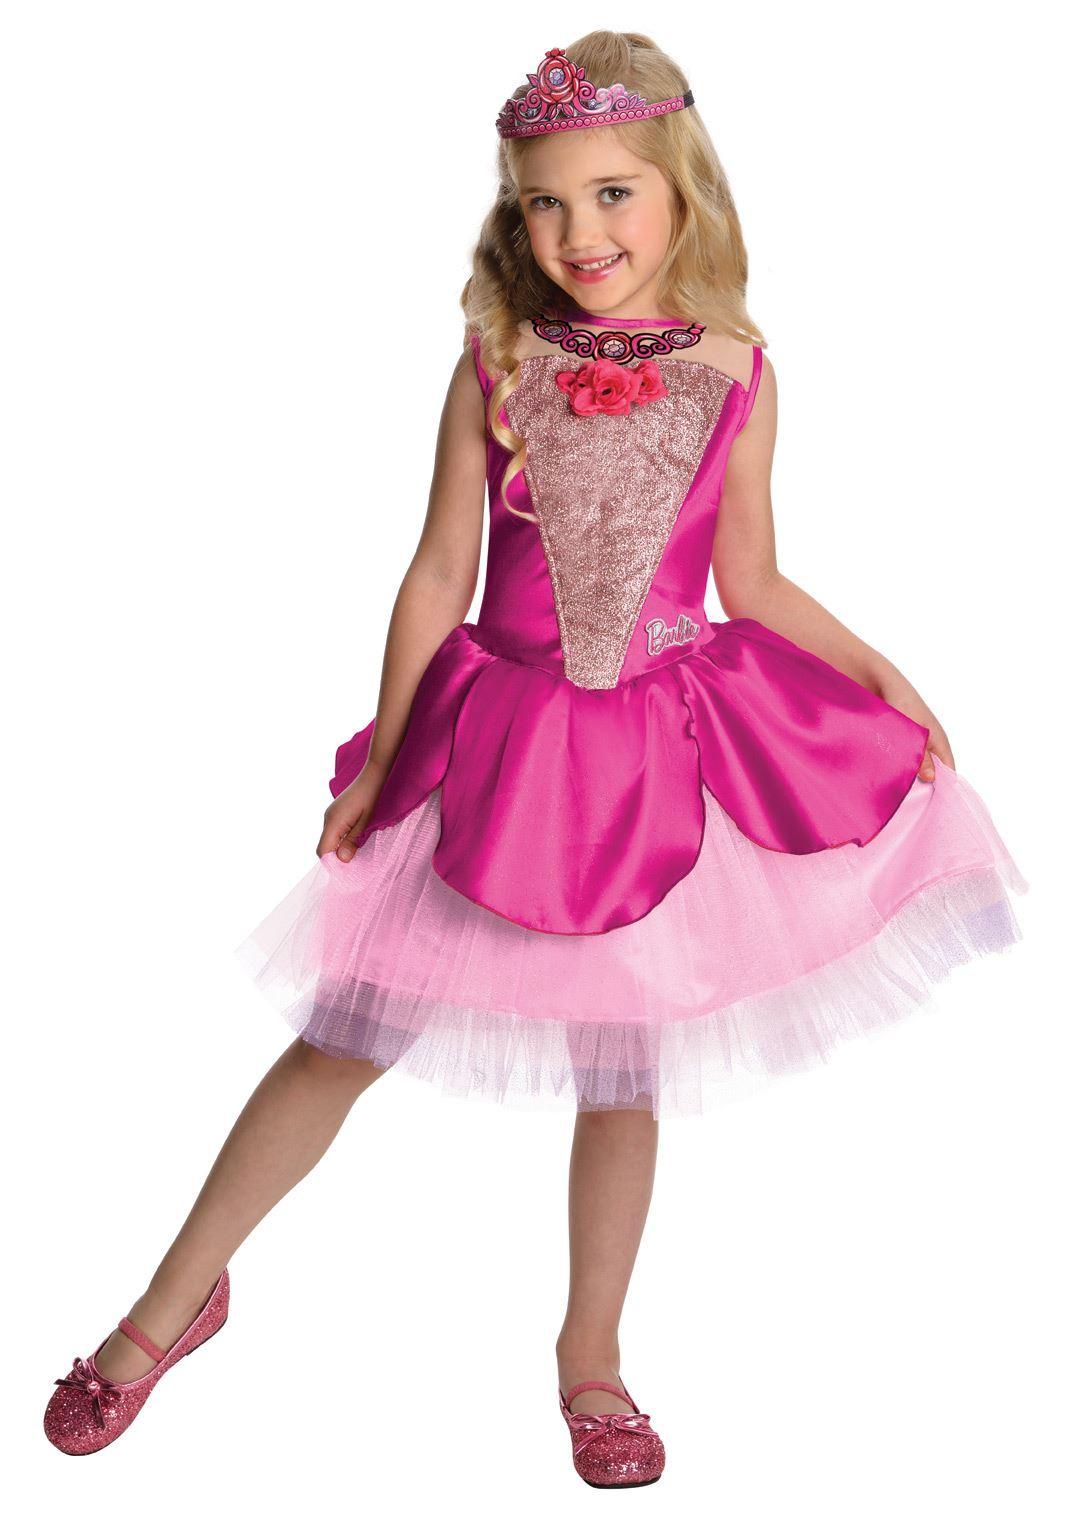 Kids Barbie Deluxe Kristyn Girls Costume | $37.99 | The Costume Land